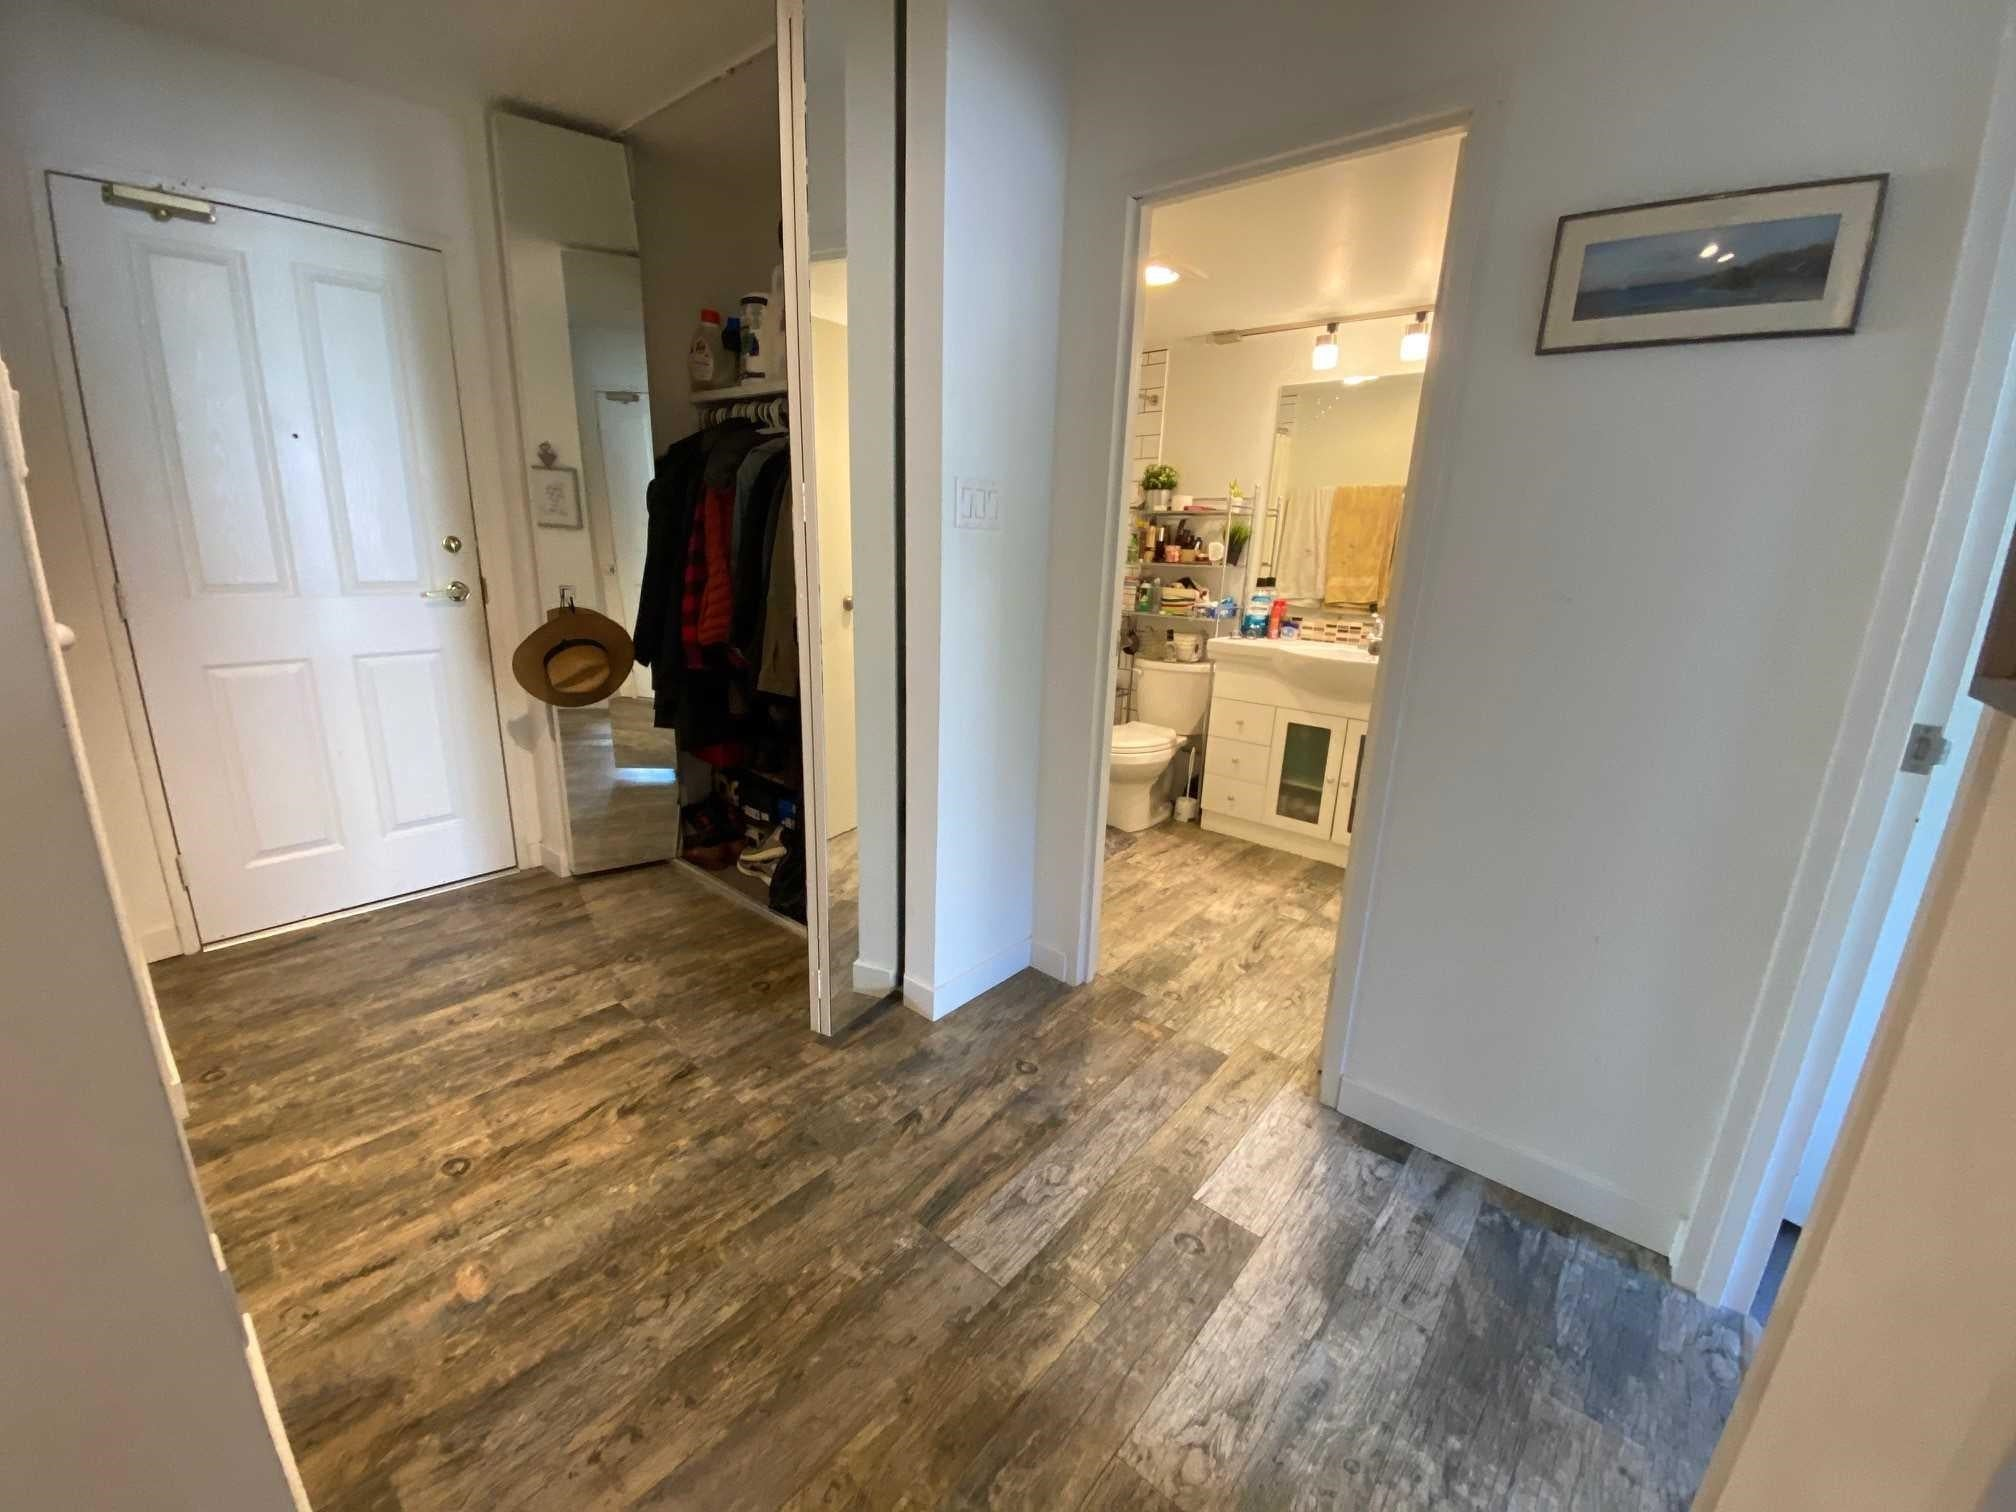 305 2004 FULLERTON AVENUE - Pemberton NV Apartment/Condo for sale, 2 Bedrooms (R2621764) - #8